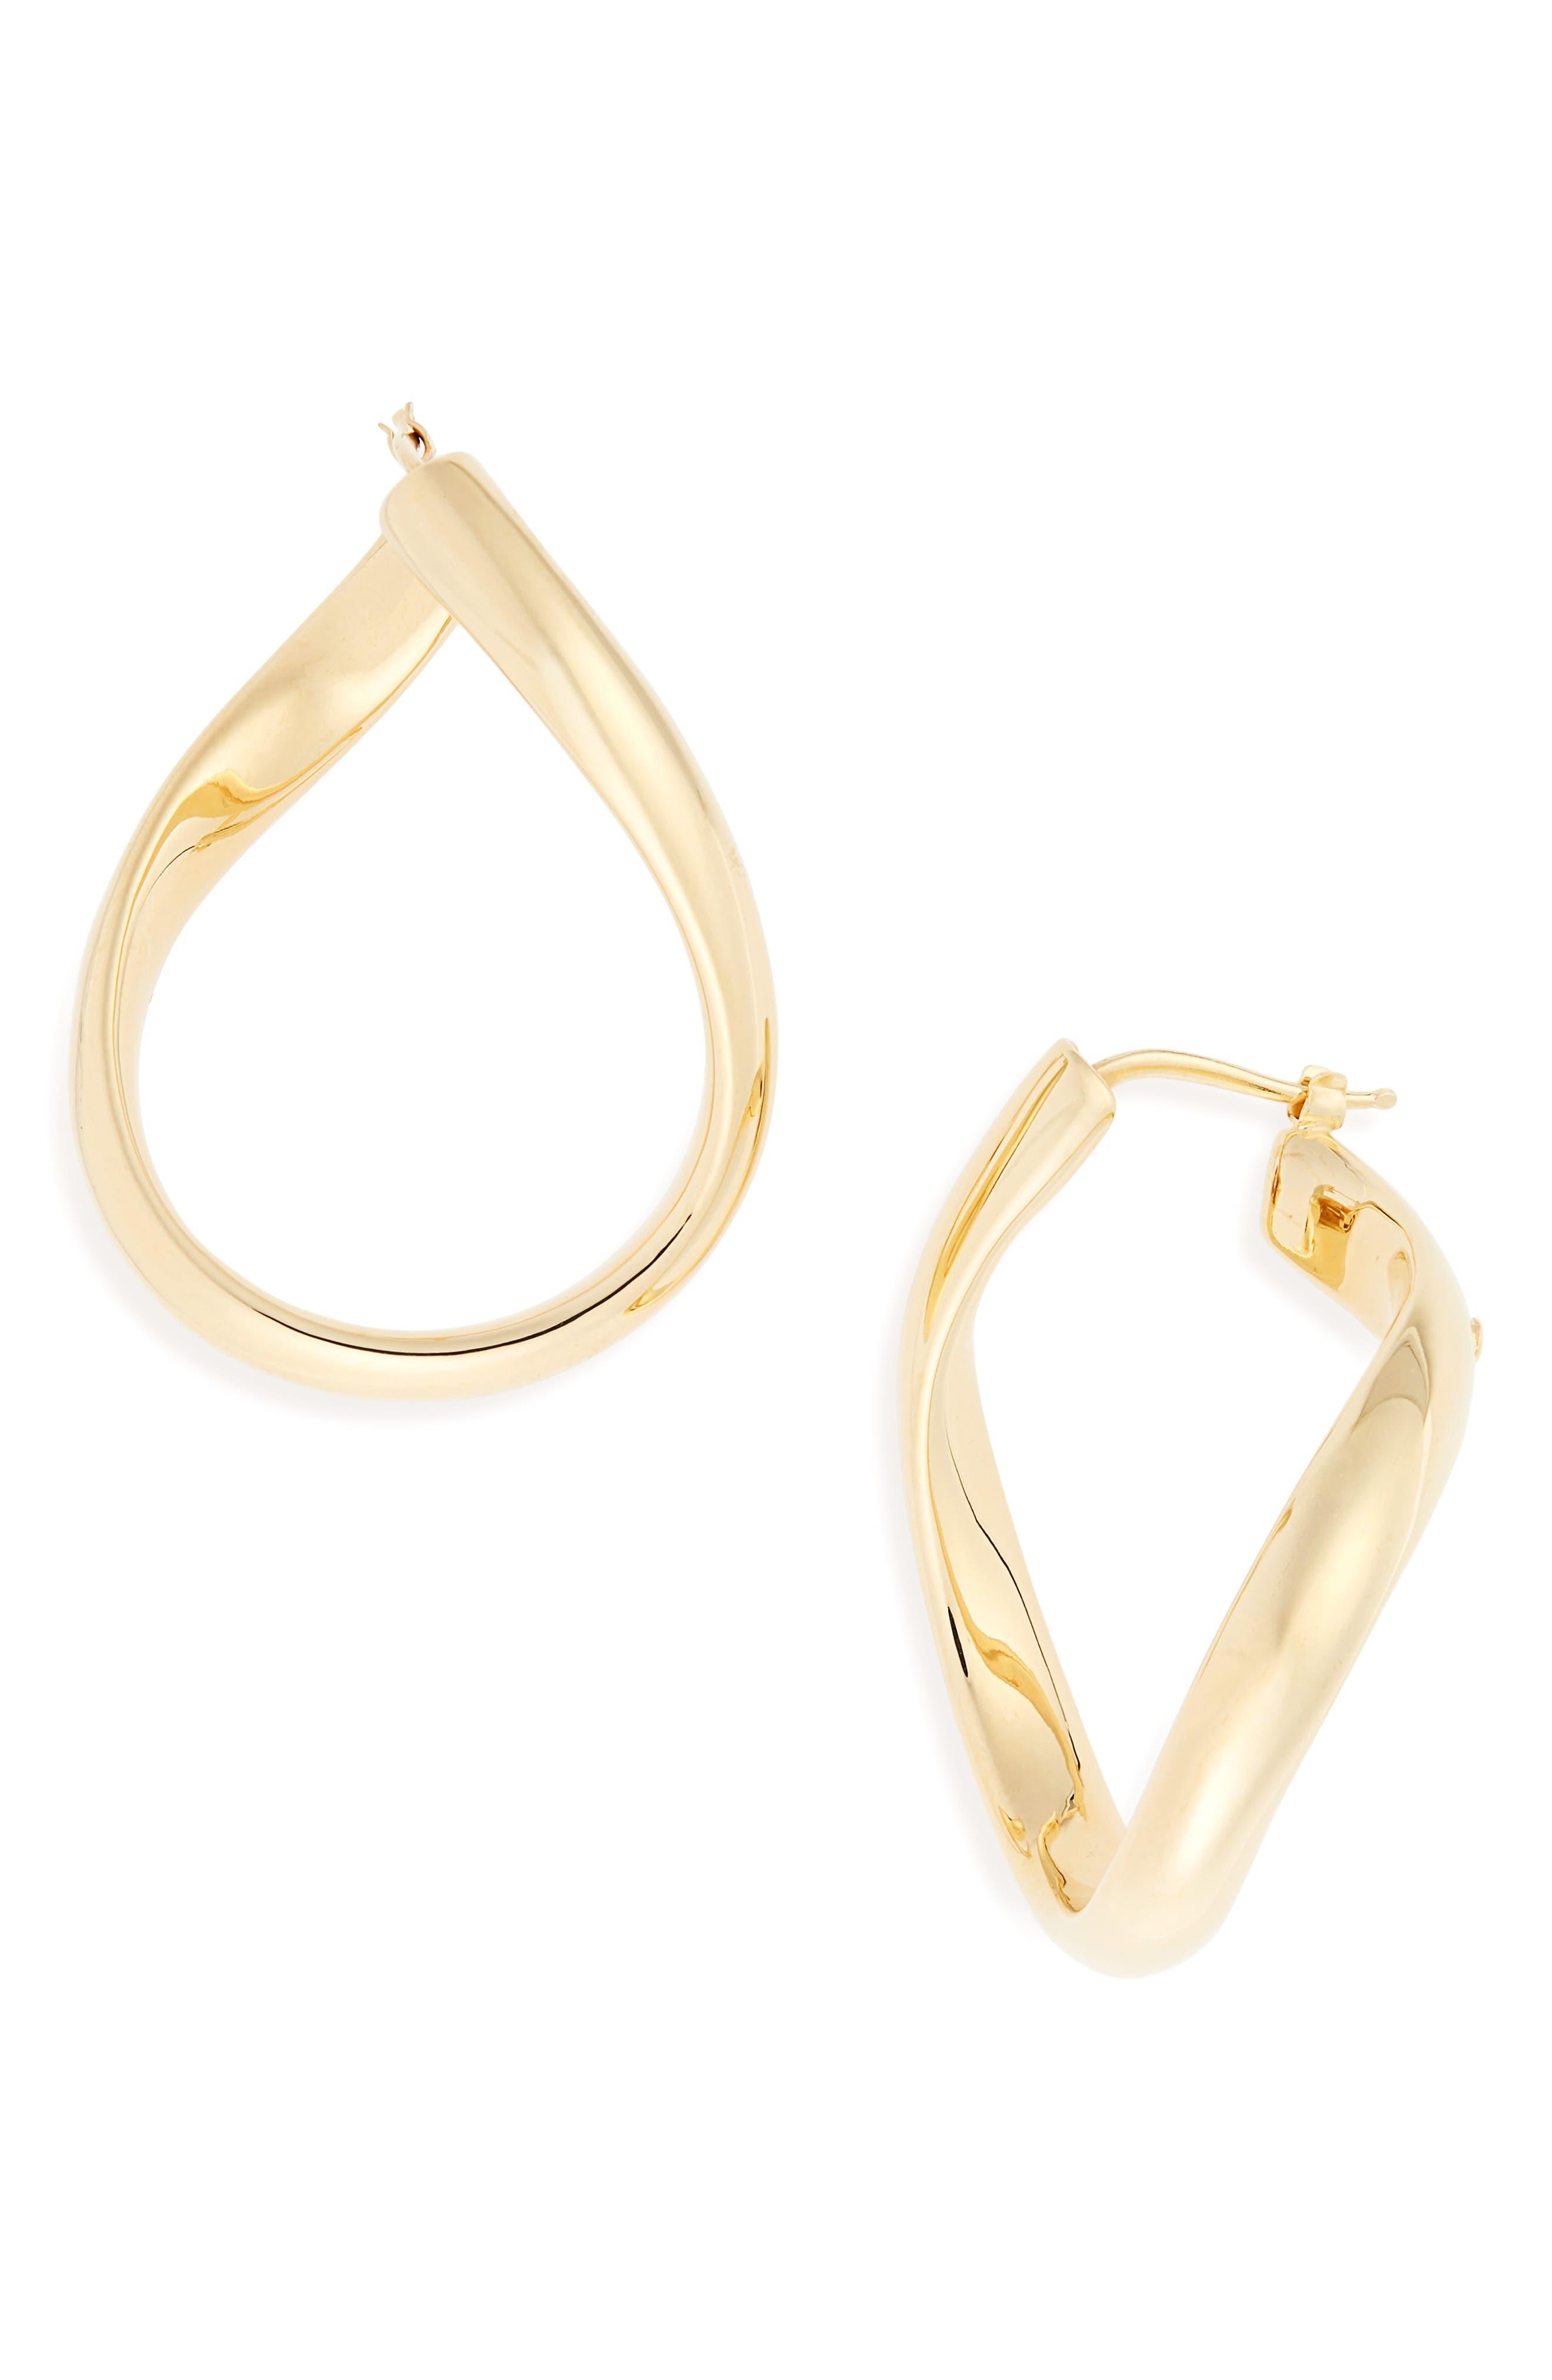 Classic Oro 18K Gold Hoop Earrings,                             Main thumbnail 1, color,                             Yellow Gold